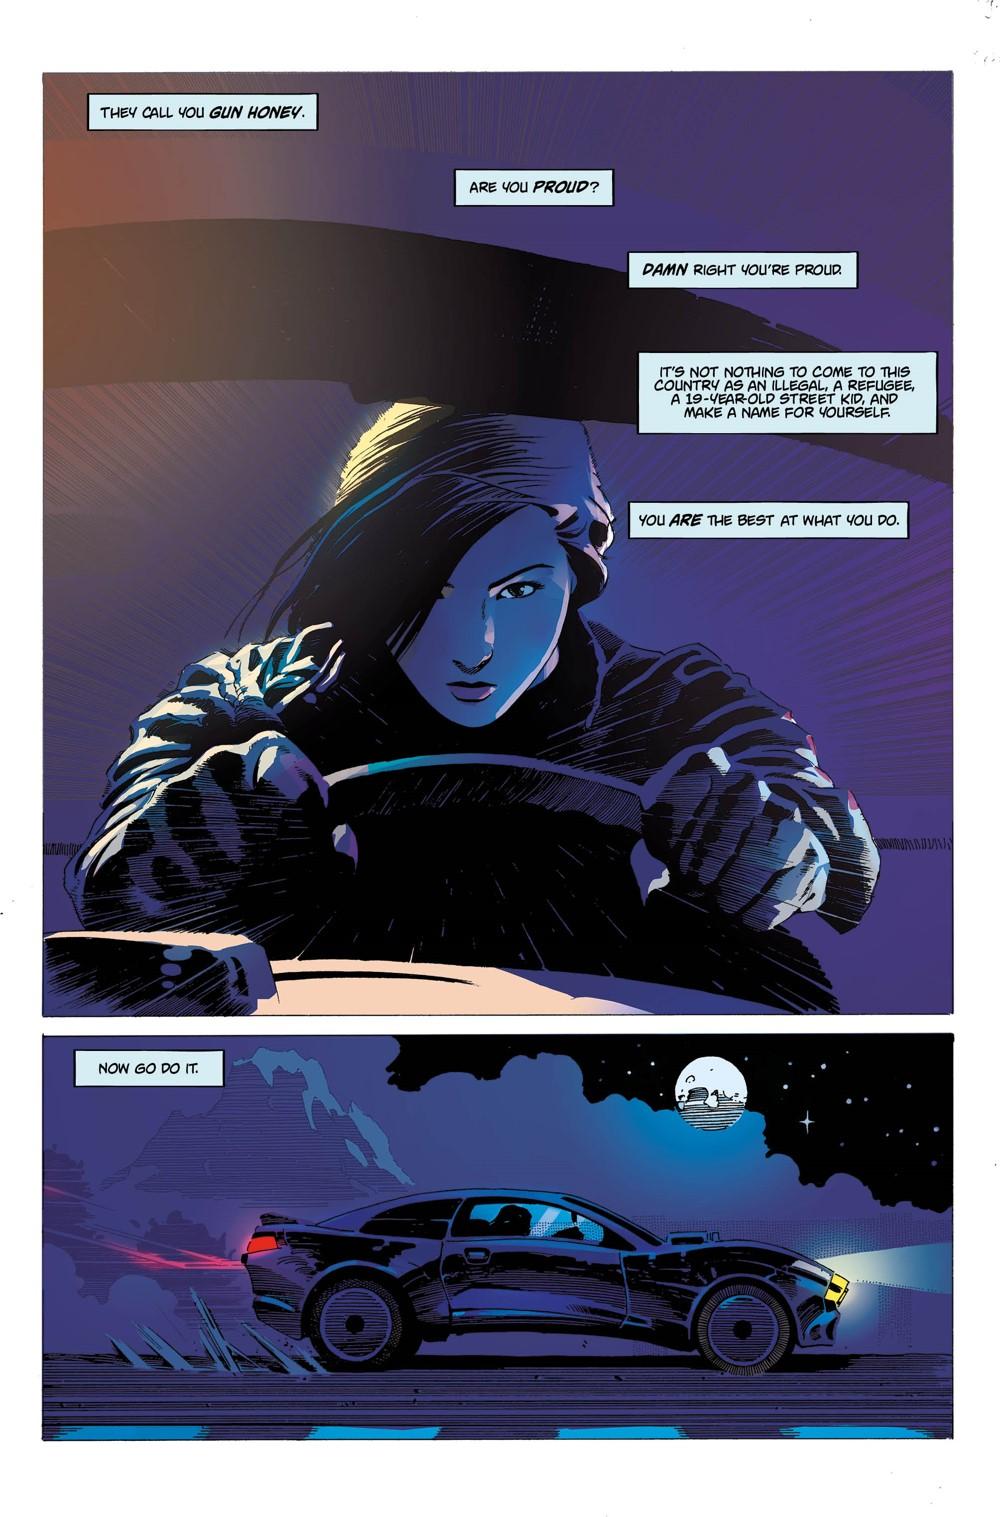 4 ComicList Previews: GUN HONEY #1